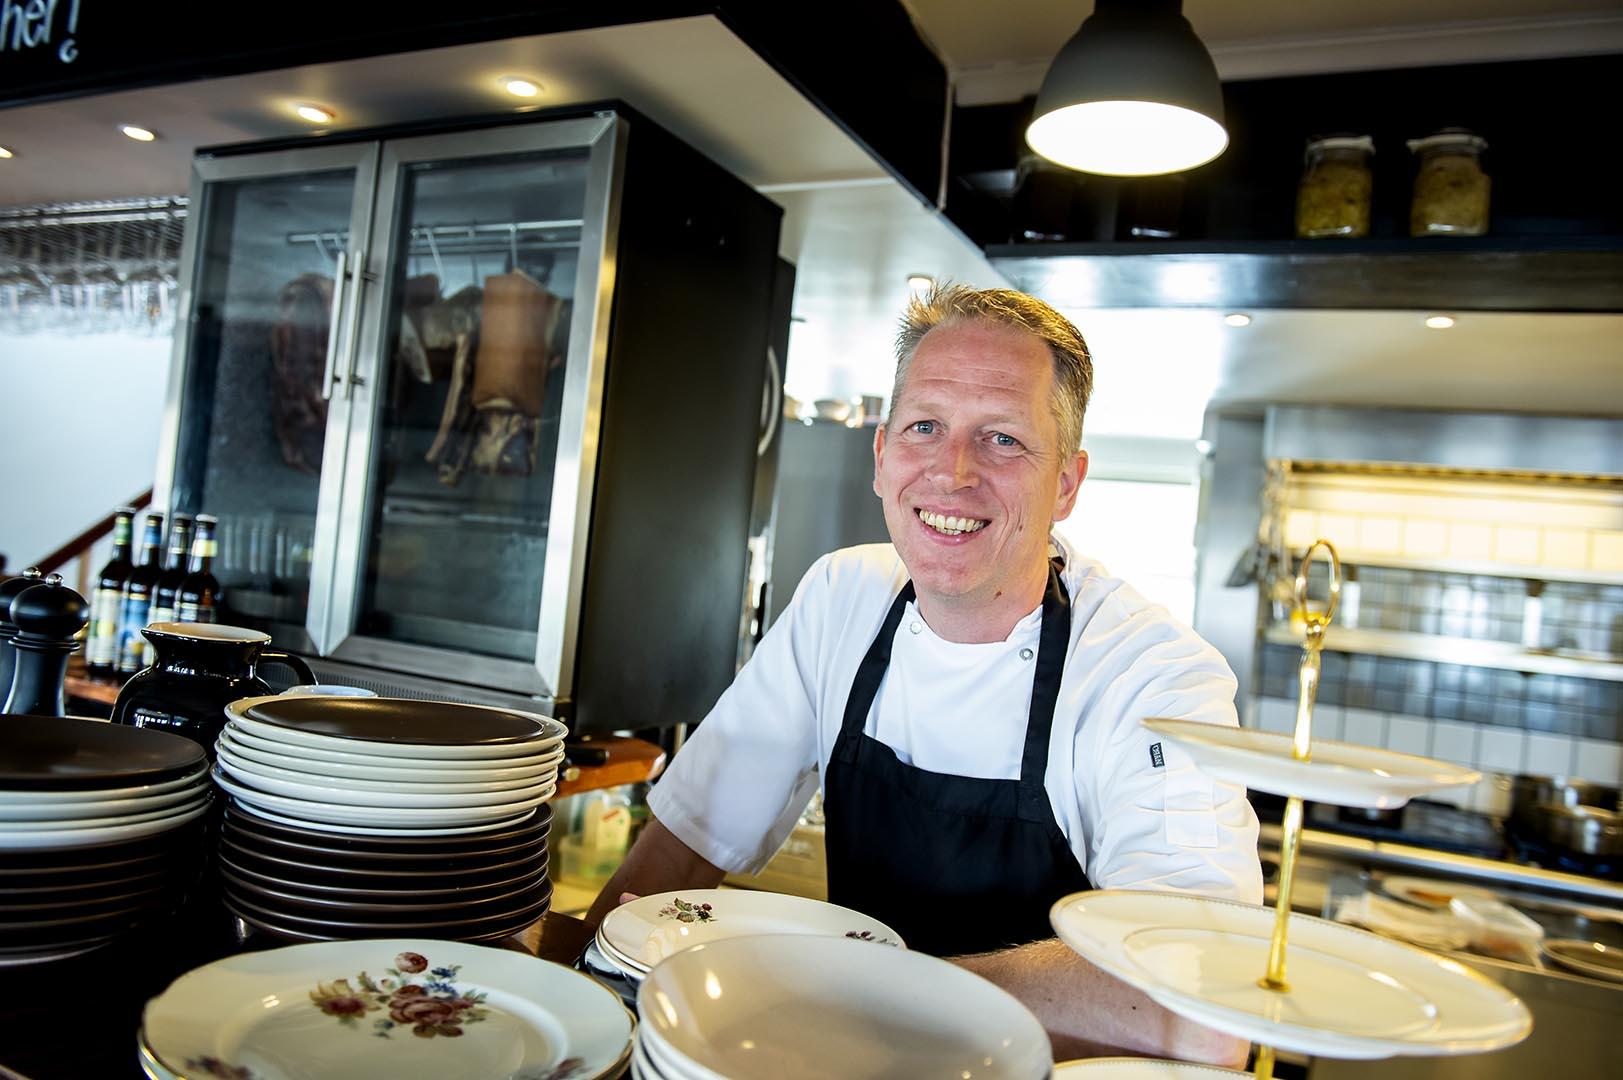 Tonny Kristensen. Restaurant Essens, Feel-good food in cosy surroundings, Scan Magazine